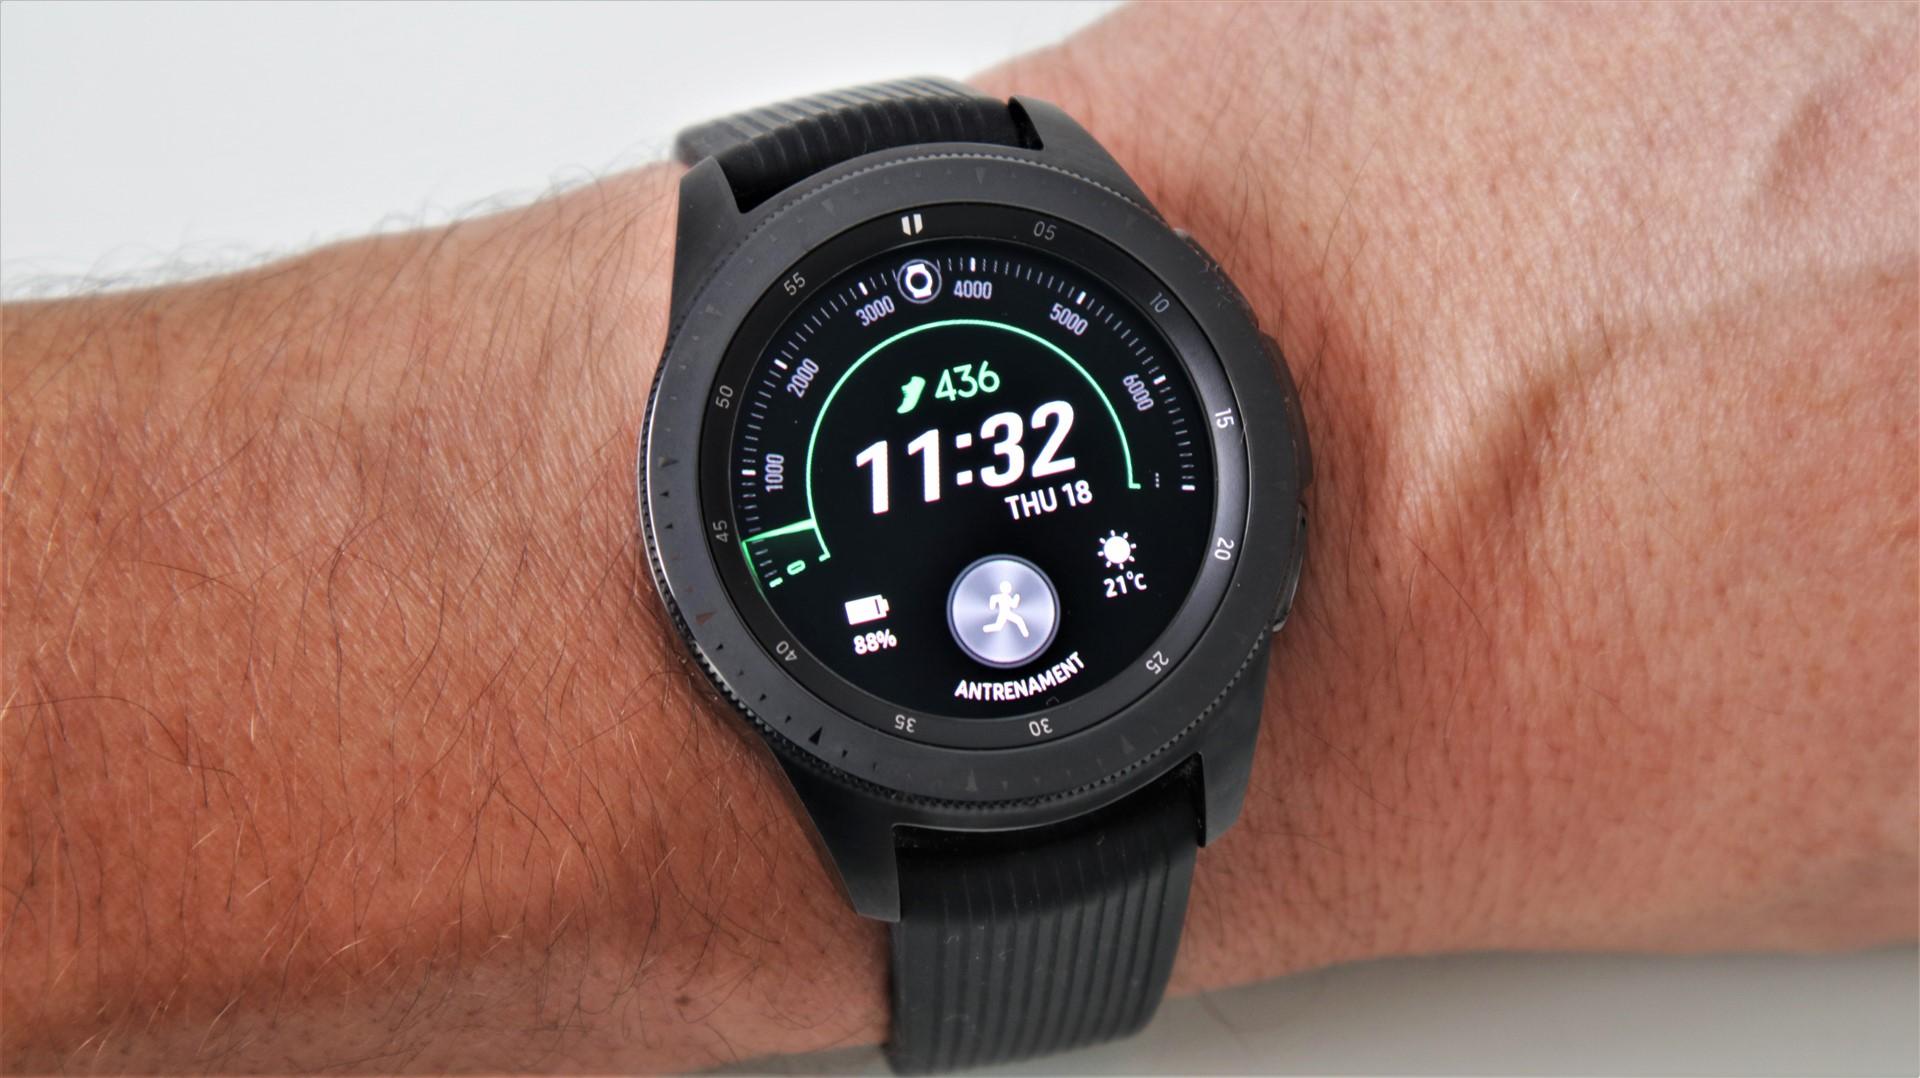 Samsung Galaxy Watch 42mm Bluetooth - review : Gadget ro